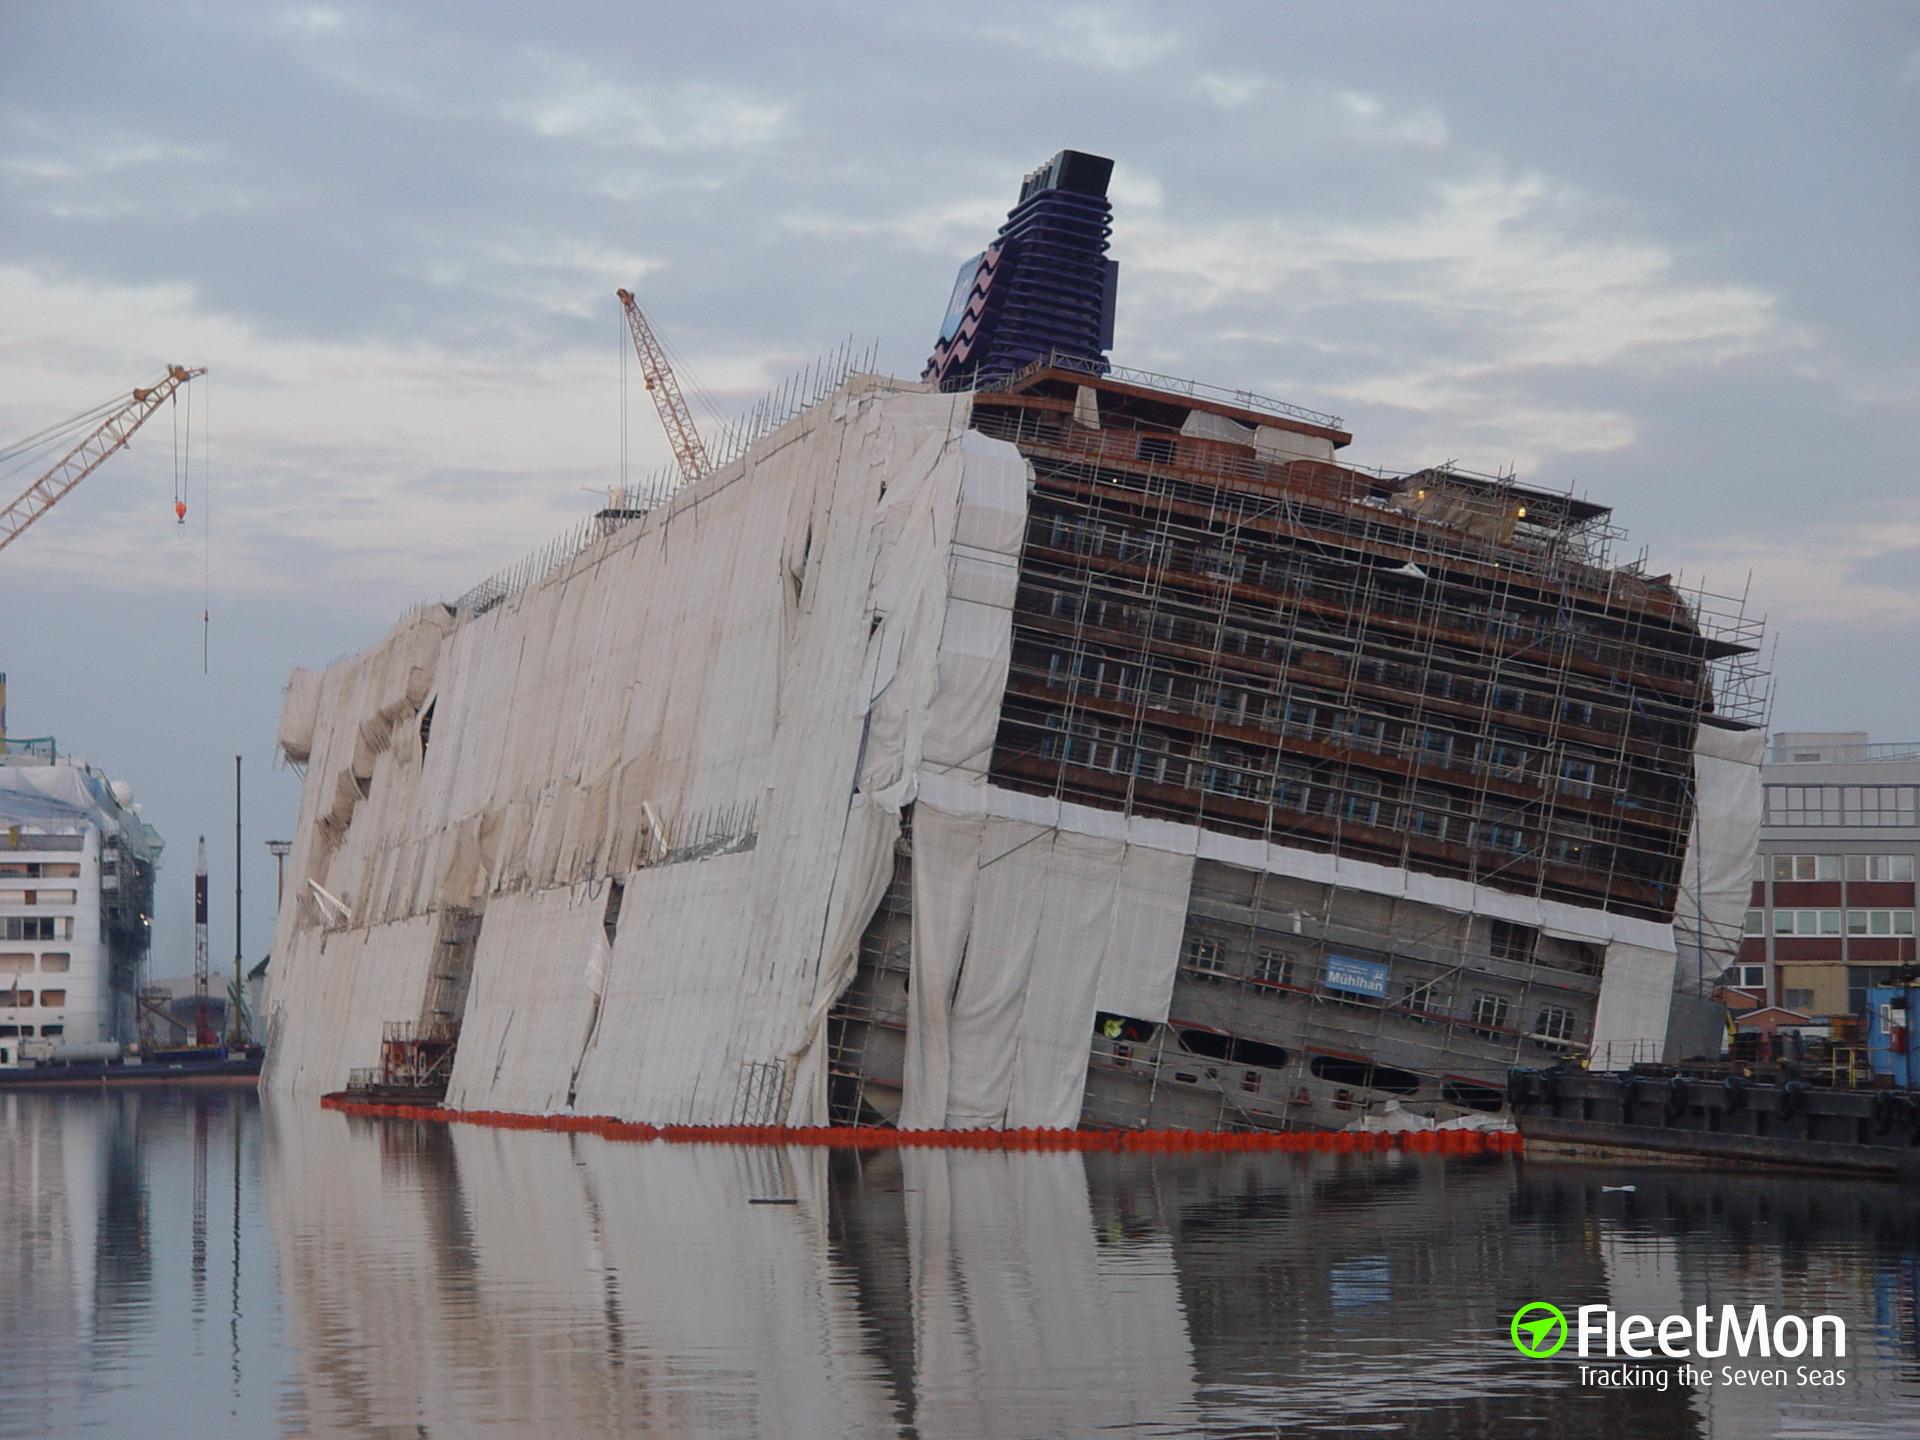 Pride Of America Passenger Ship Imo 9209221